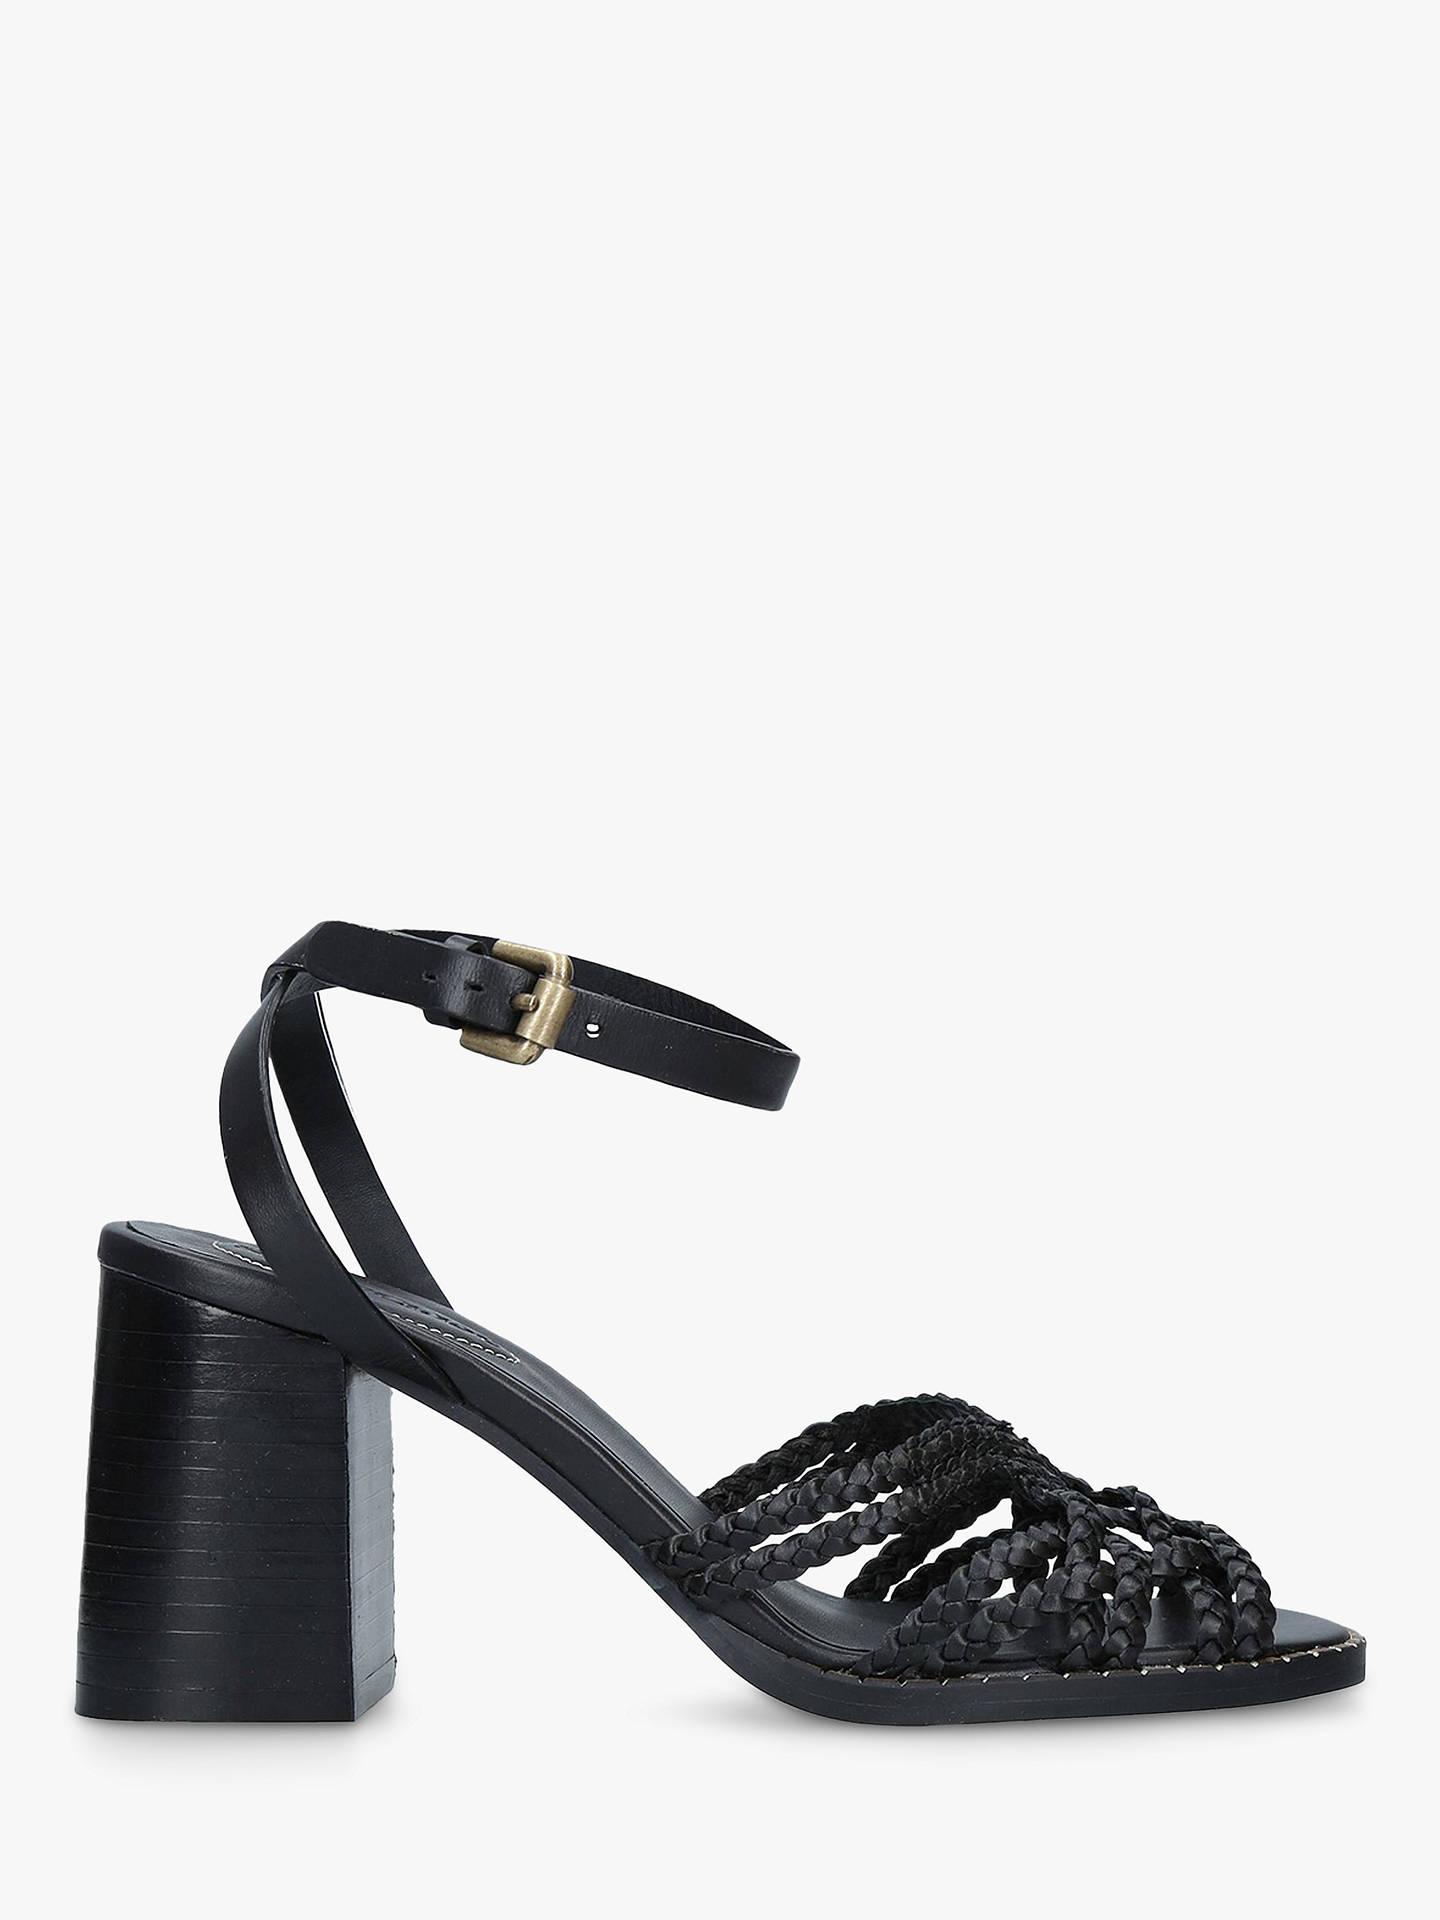 091571368bb Buy See By Chloé Gladiator Braid Block Heel Sandals